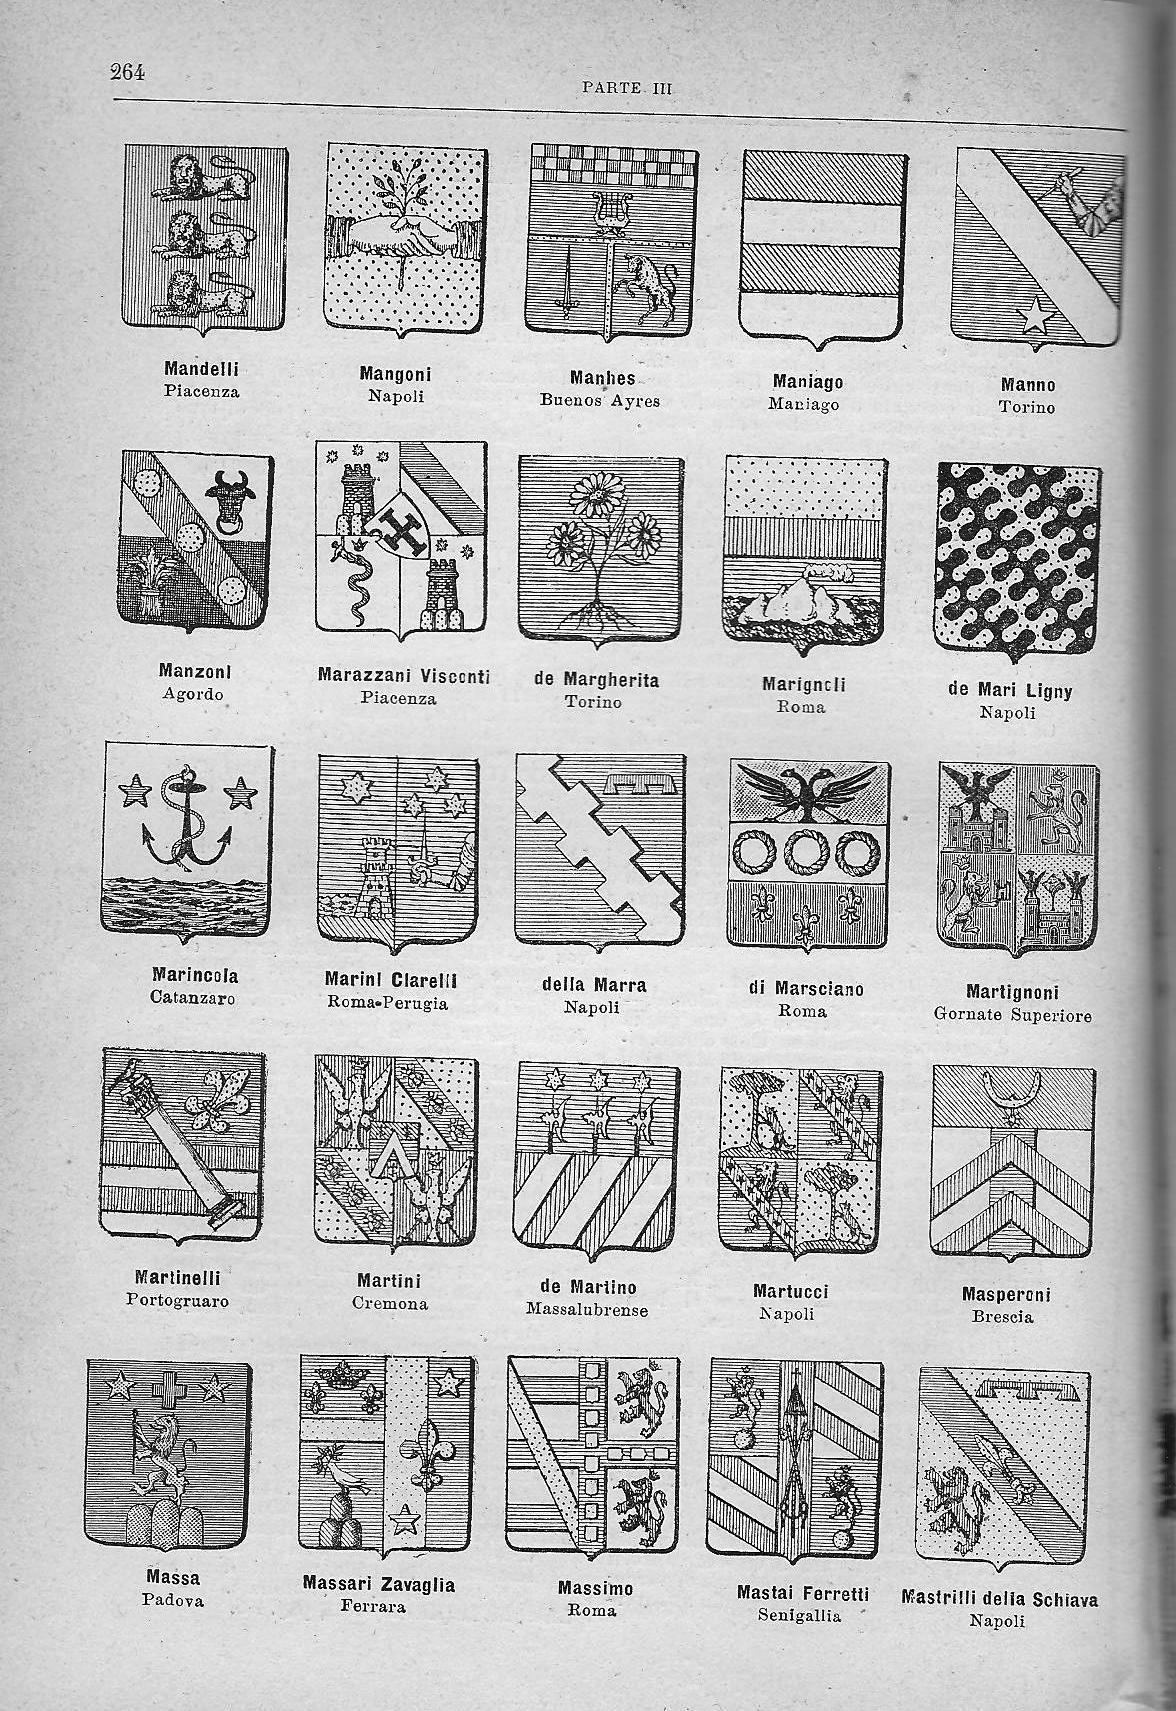 Calendario 1900.File Calendario D Oro 1900 Pagina 264 Jpg Wikimedia Commons